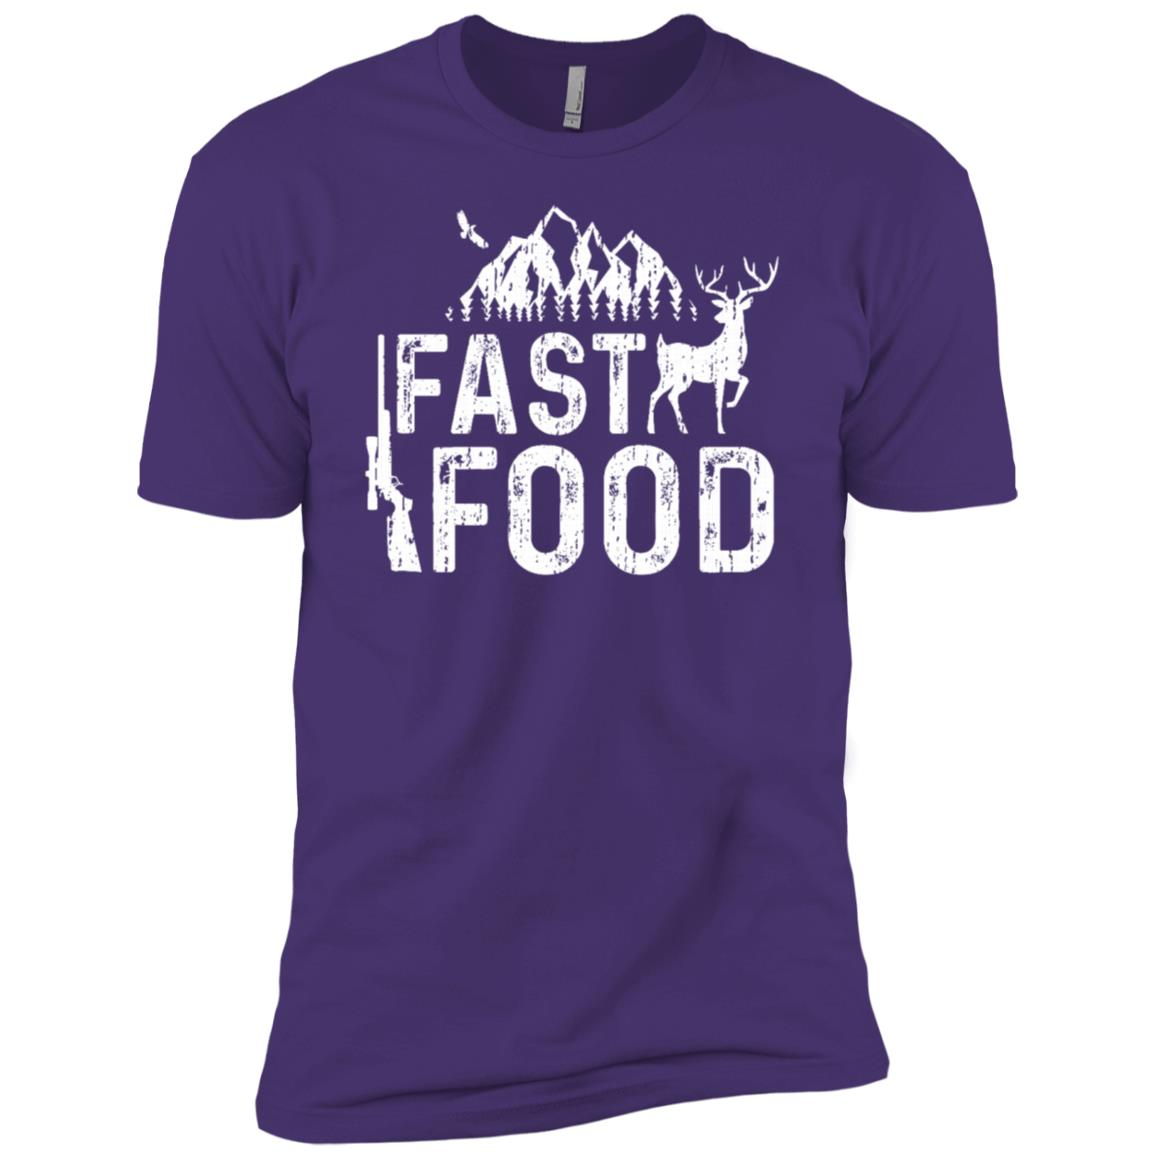 Fast Food Hunting Deer Hunting Men Short Sleeve T-Shirt